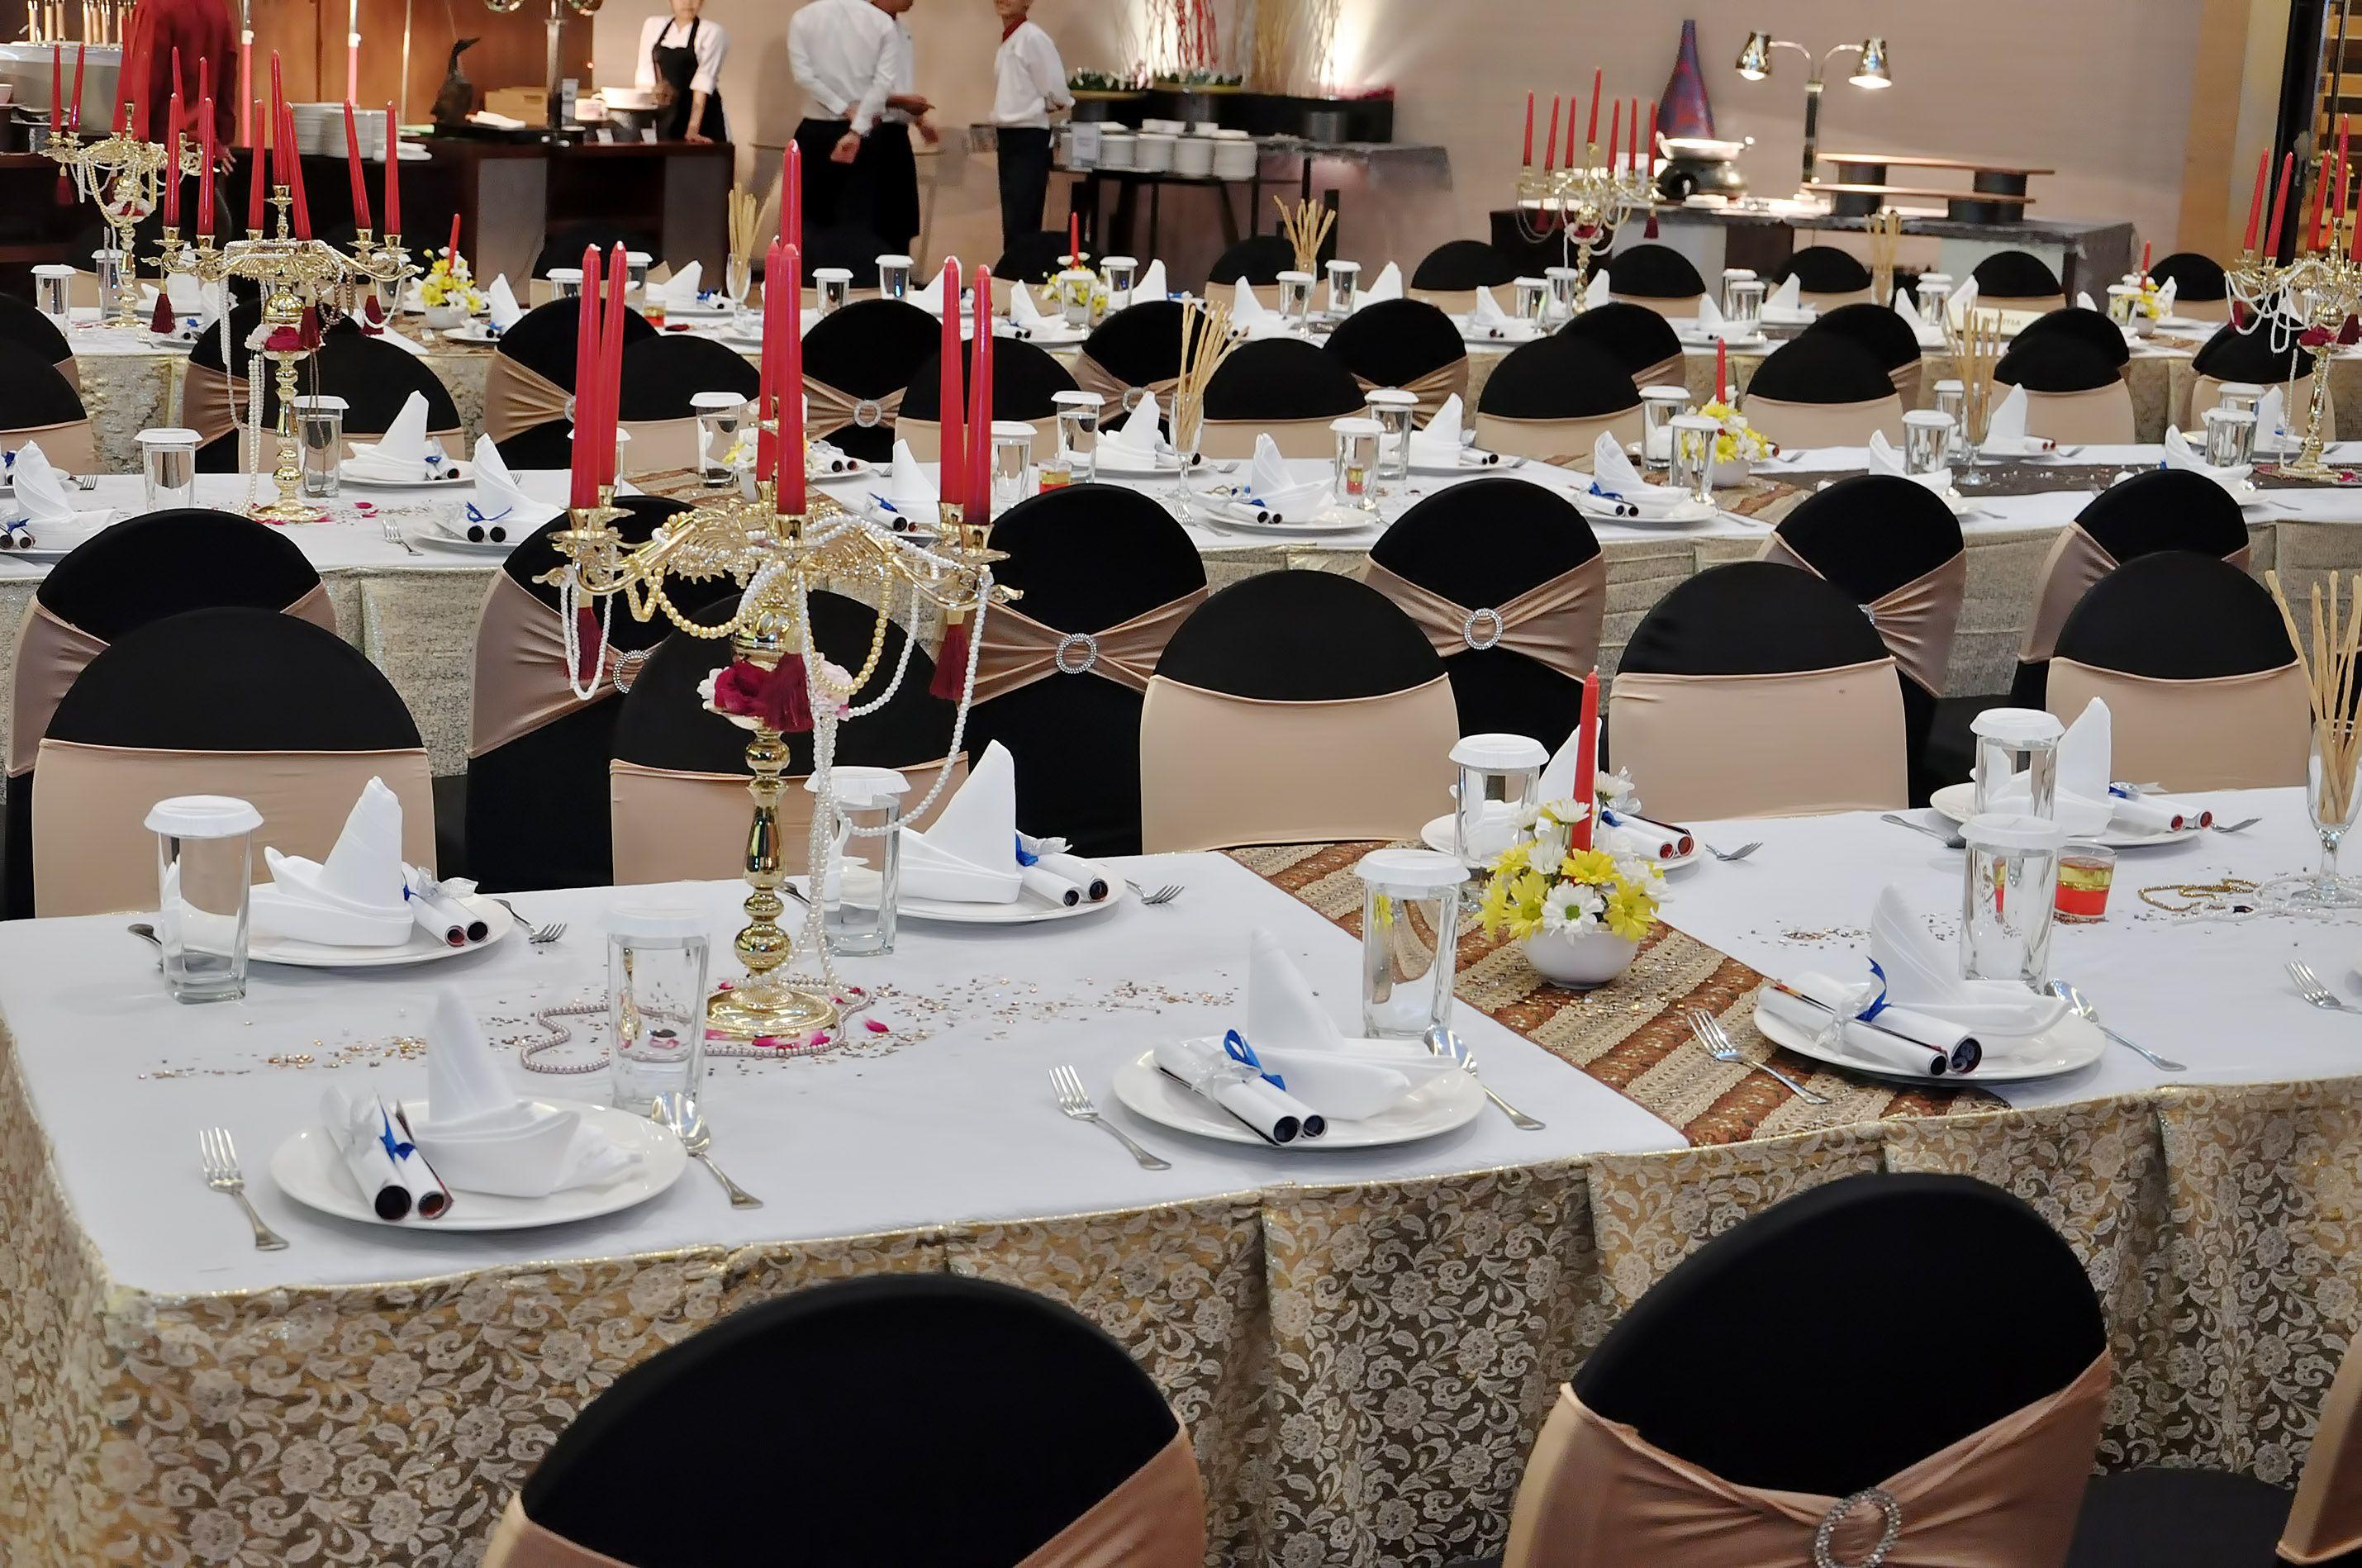 Set up fo bca meeting deco decoration hotel meeting event set up fo bca meeting deco decoration hotel meeting event junglespirit Gallery